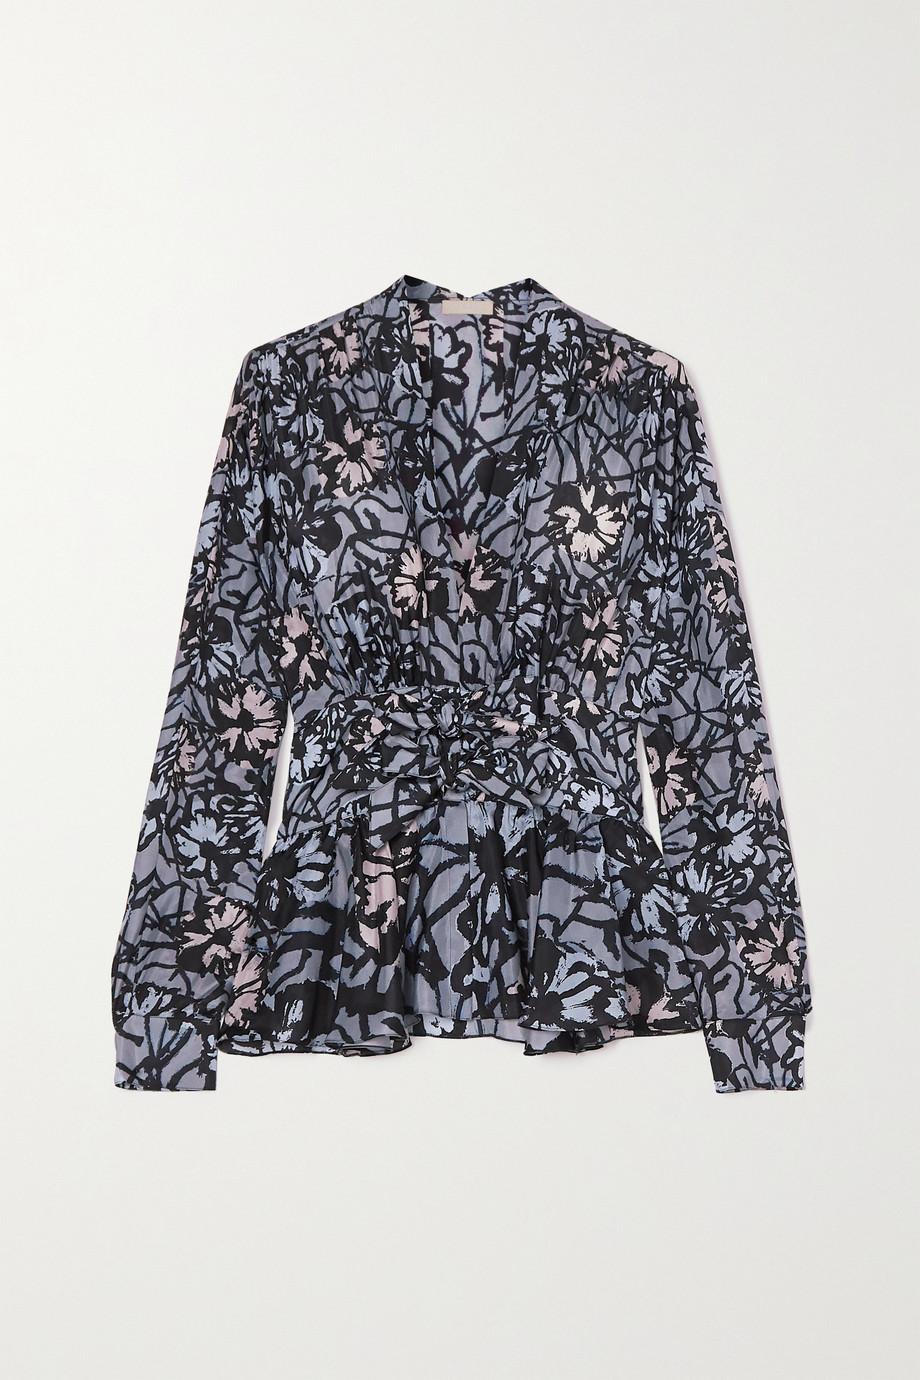 Alaïa Belted floral-print silk-habotai blouse